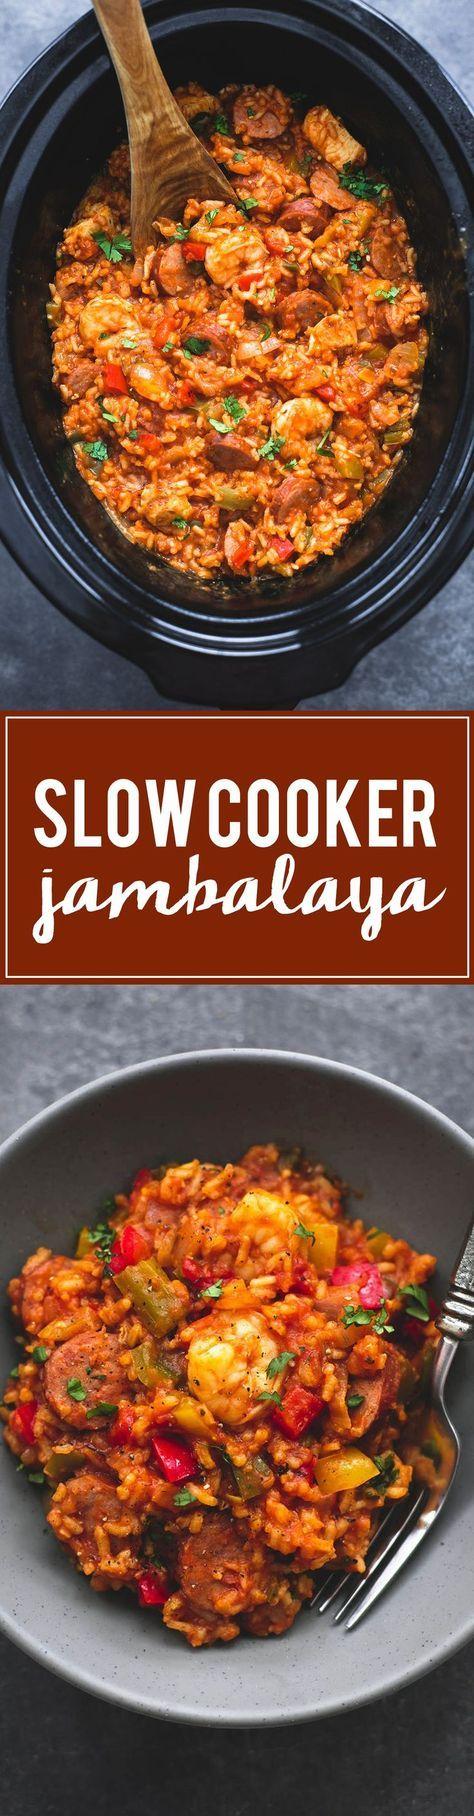 Easy and flavorful Slow Cooker Jambalaya | http://lecremedelacrumb.com